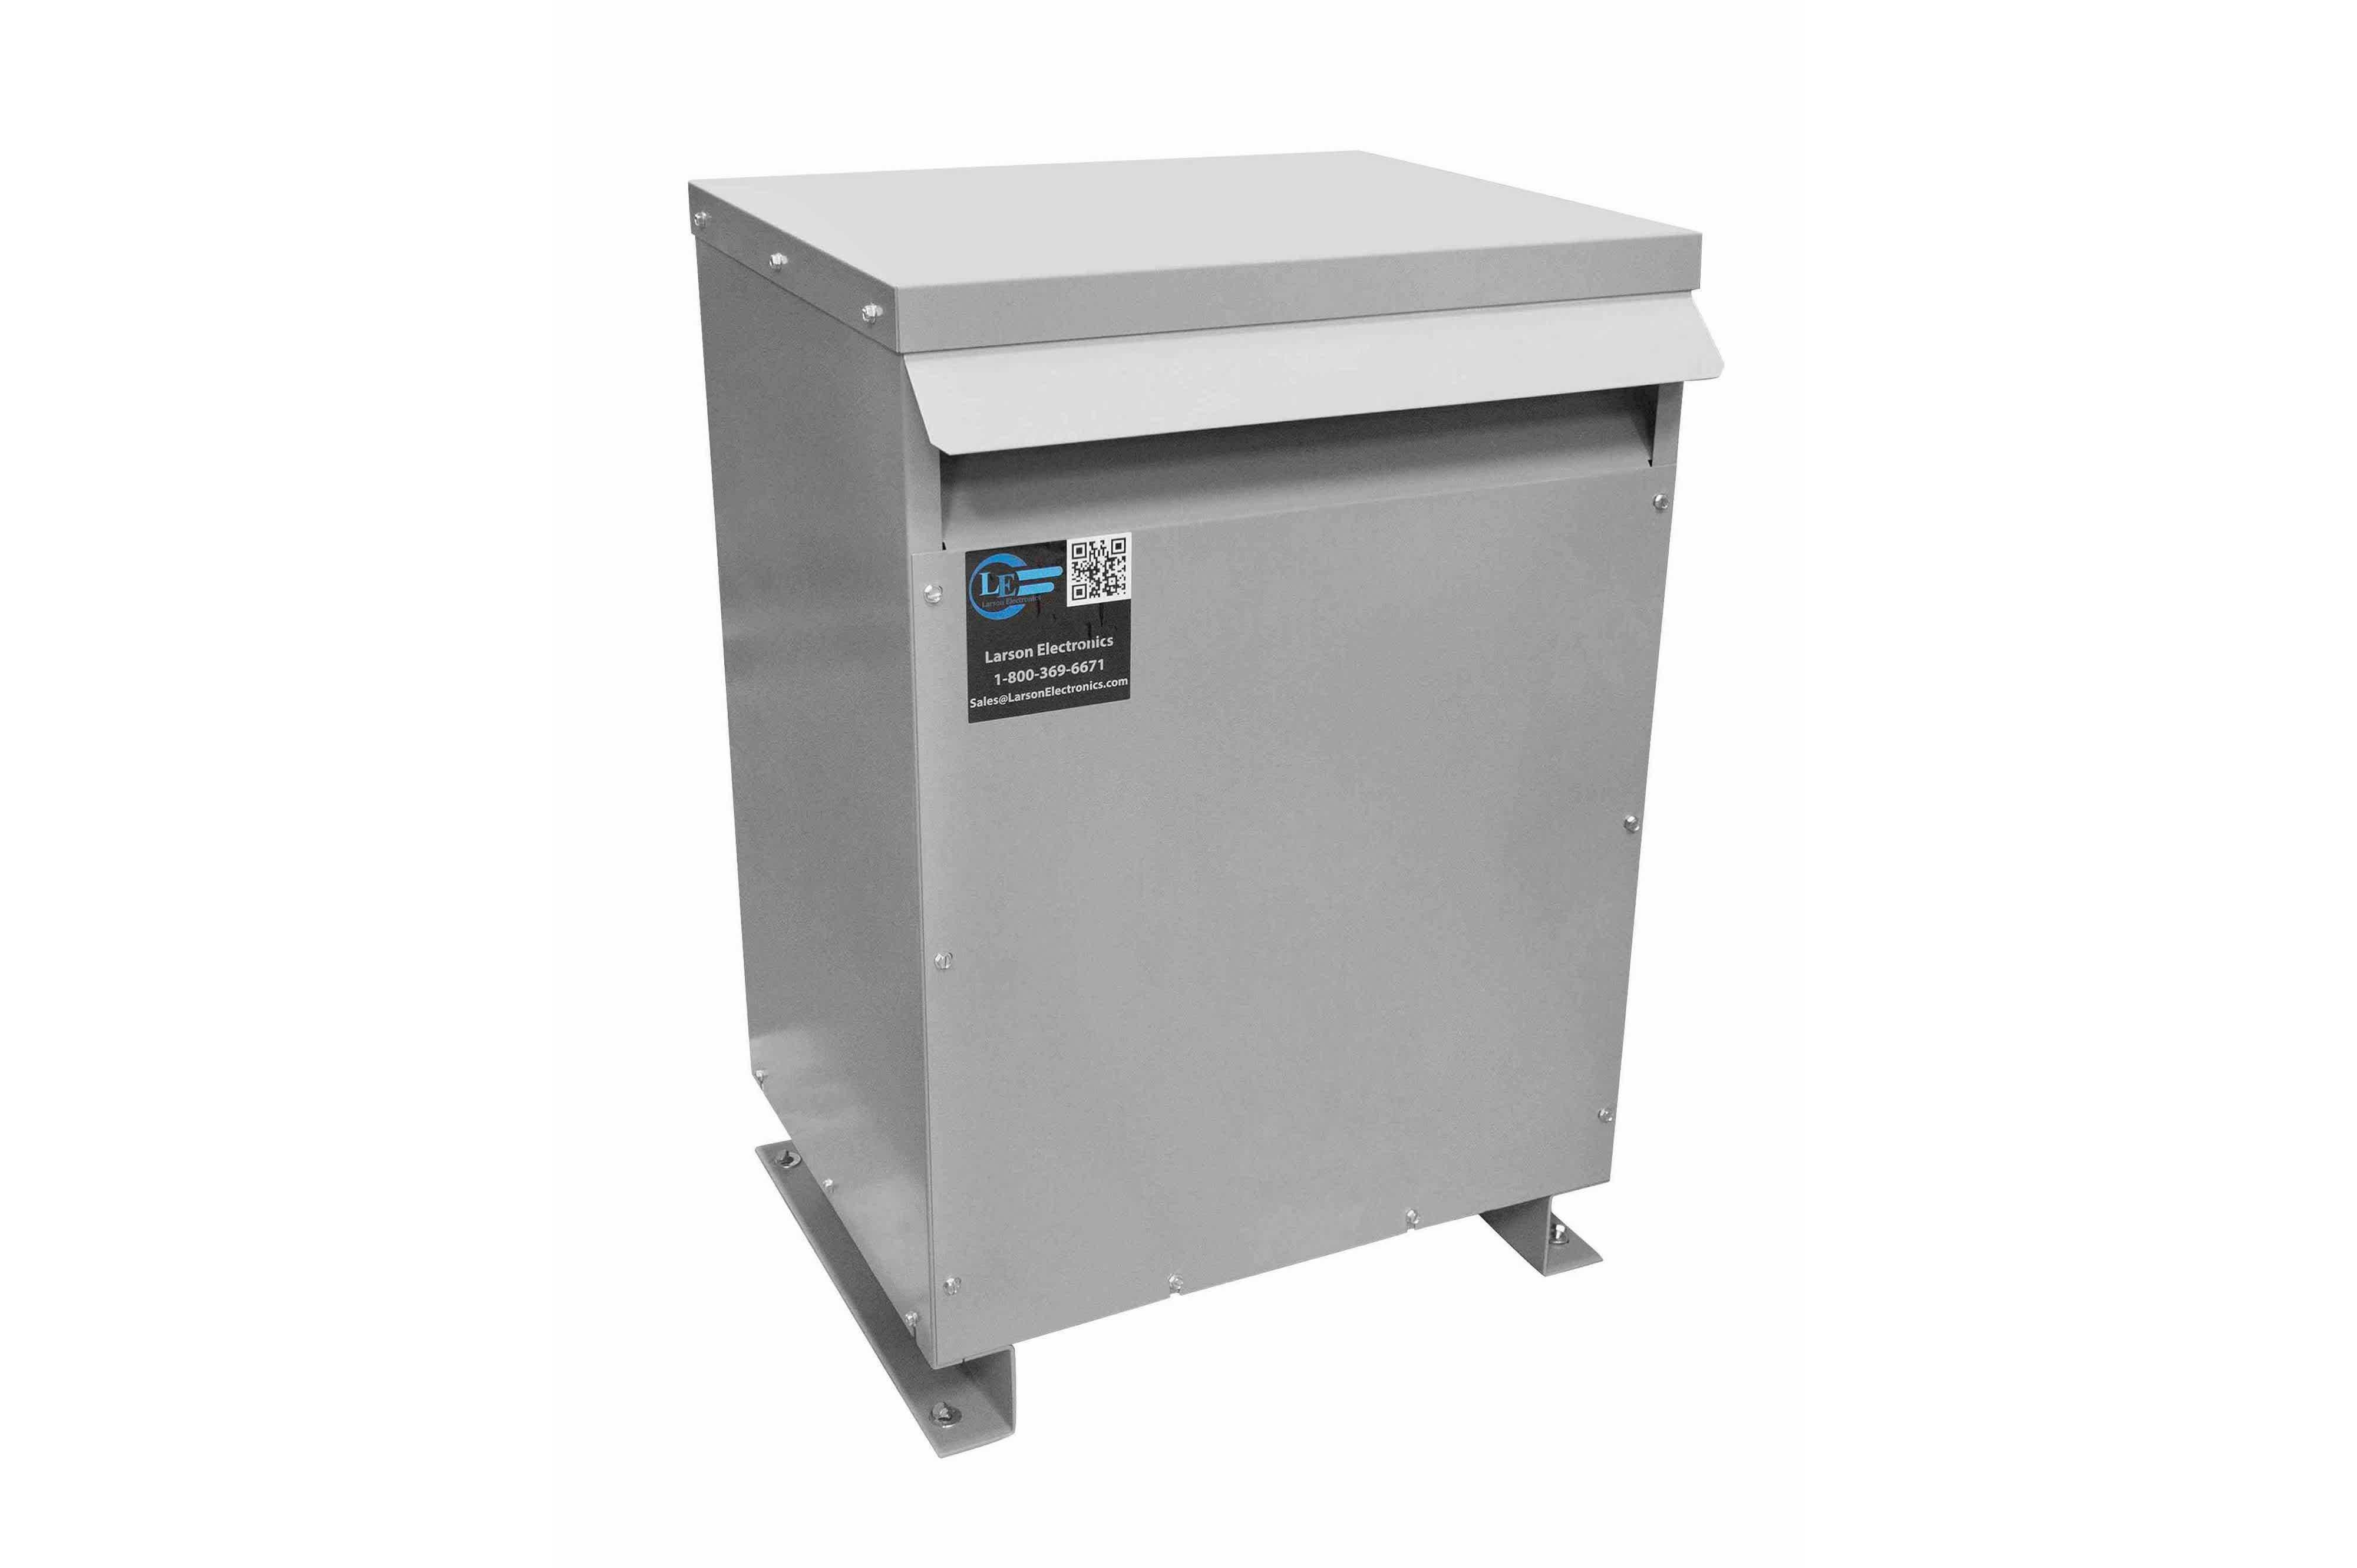 100 kVA 3PH Isolation Transformer, 230V Wye Primary, 208Y/120 Wye-N Secondary, N3R, Ventilated, 60 Hz